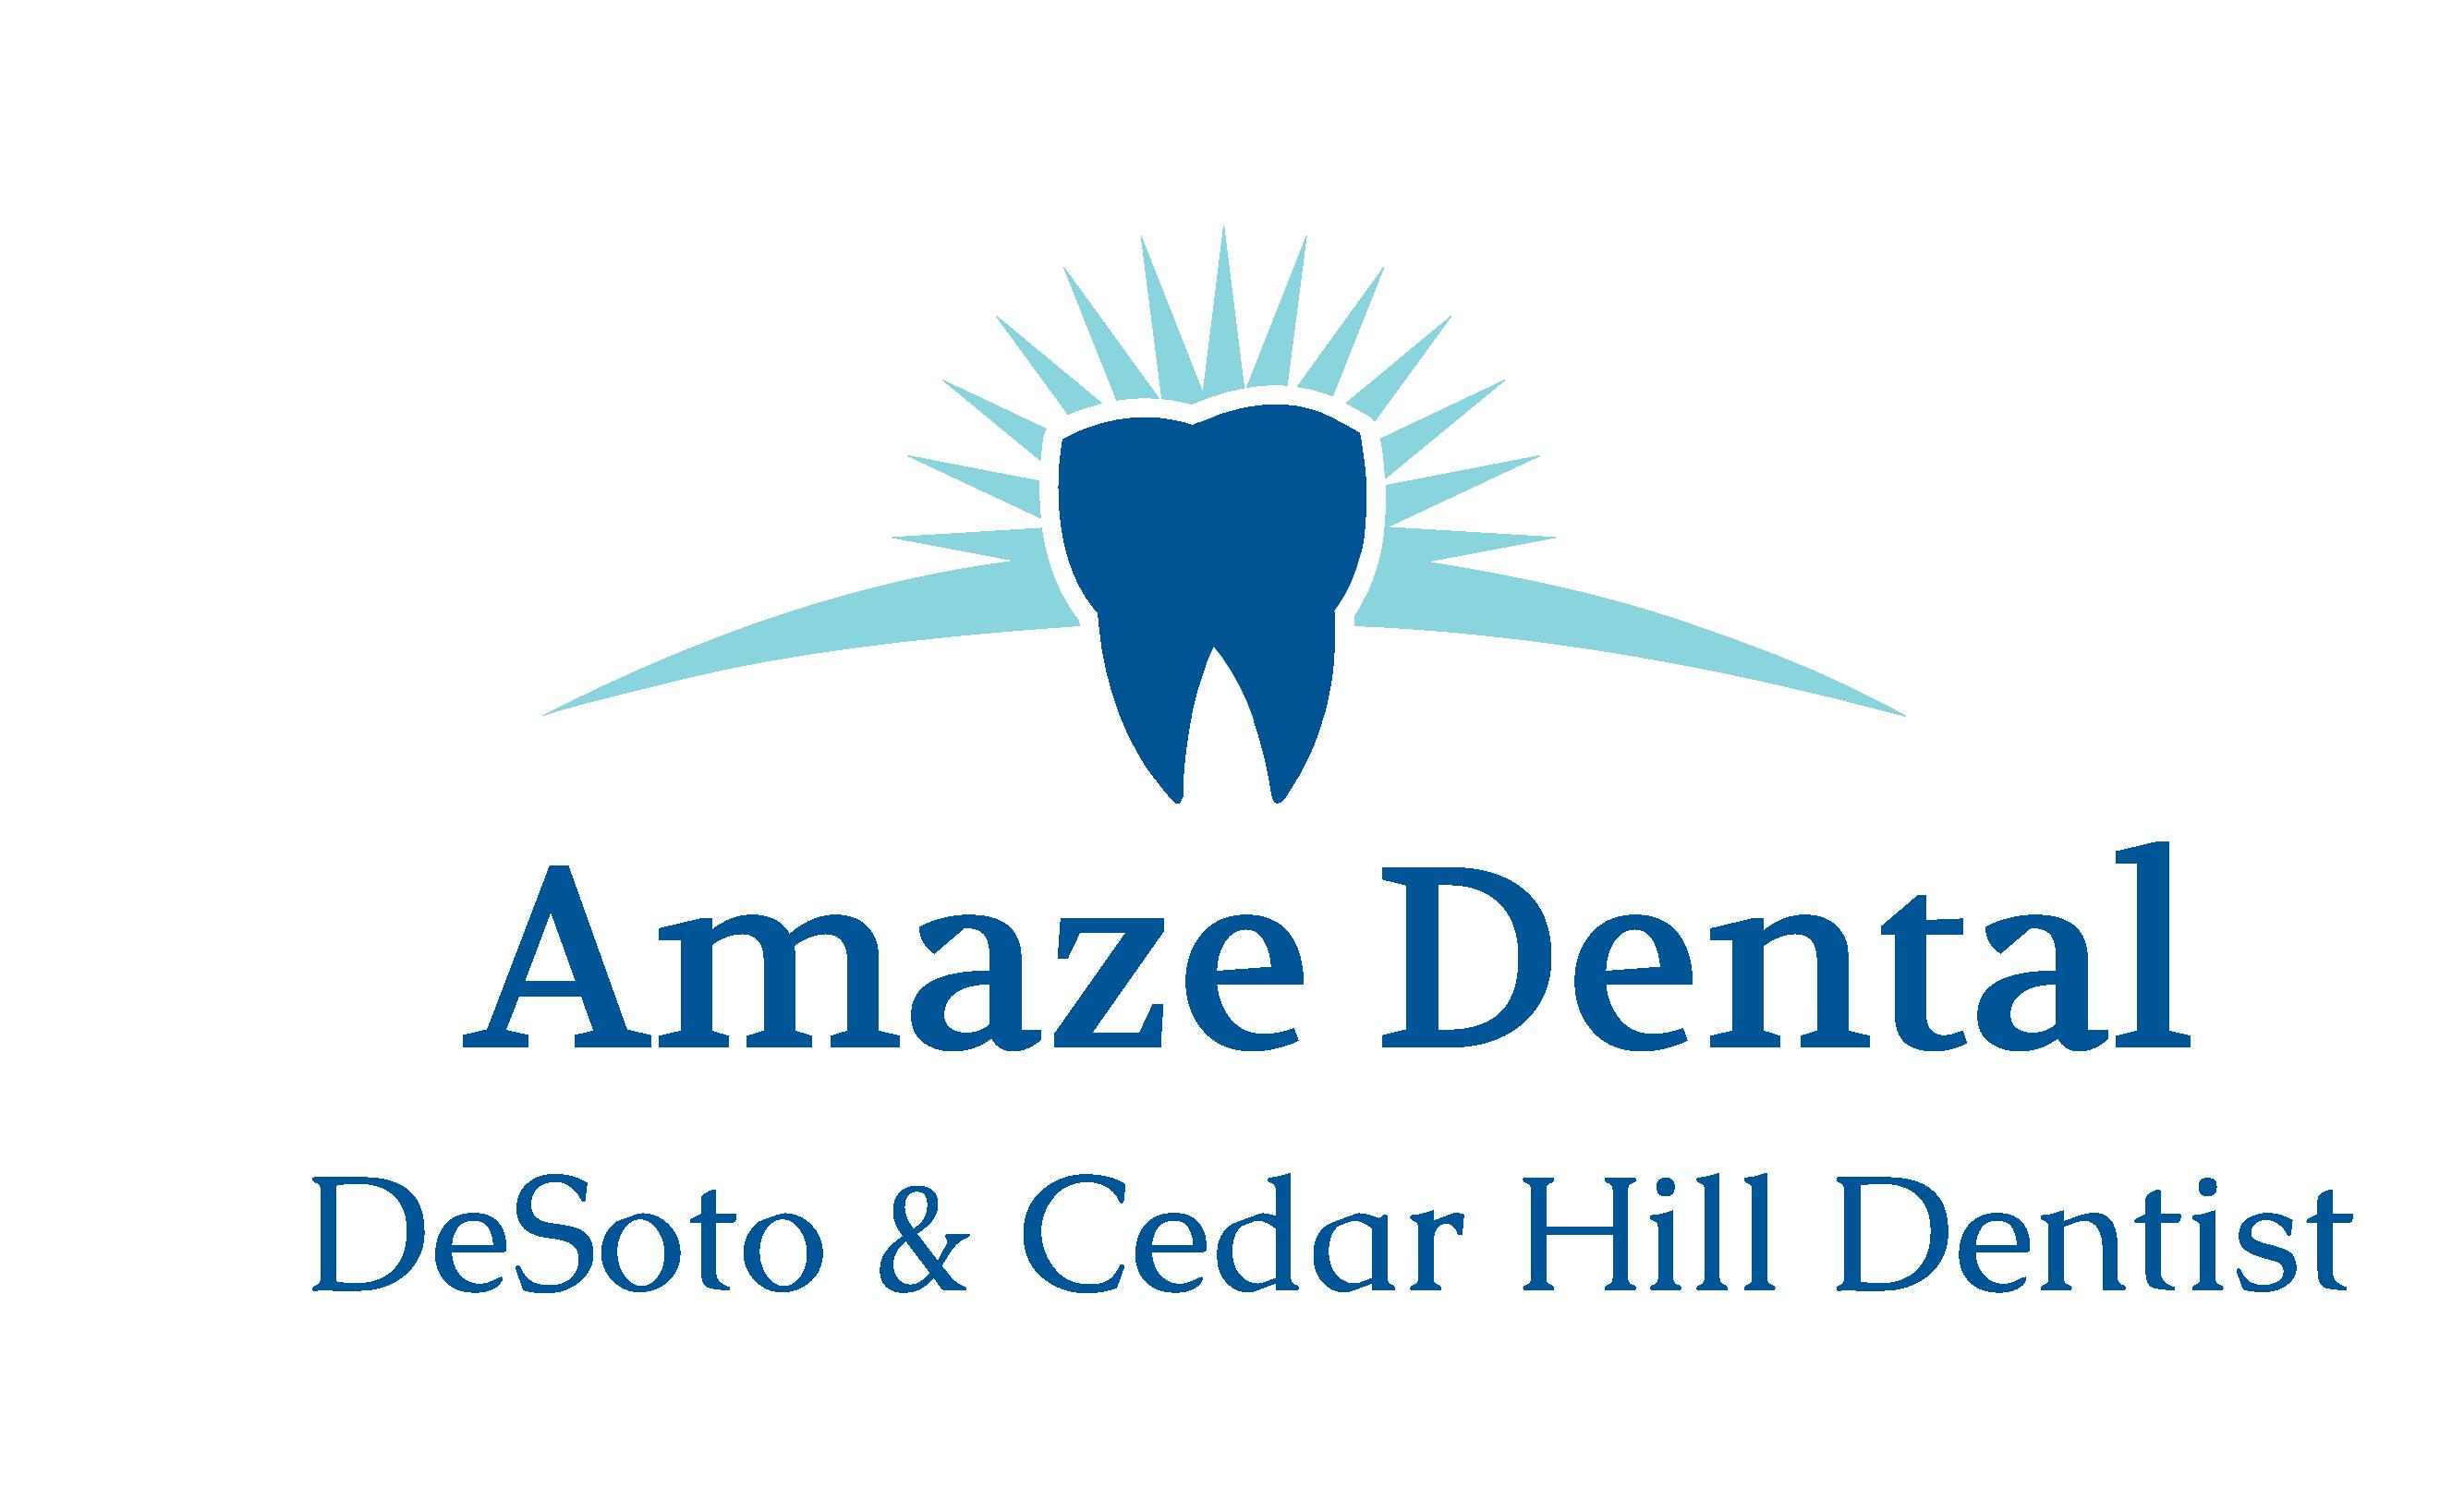 Amaze Dental - DeSoto & Cedar Hill Dentist | General Dentistry at 216 Dalton Dr - DeSoto TX